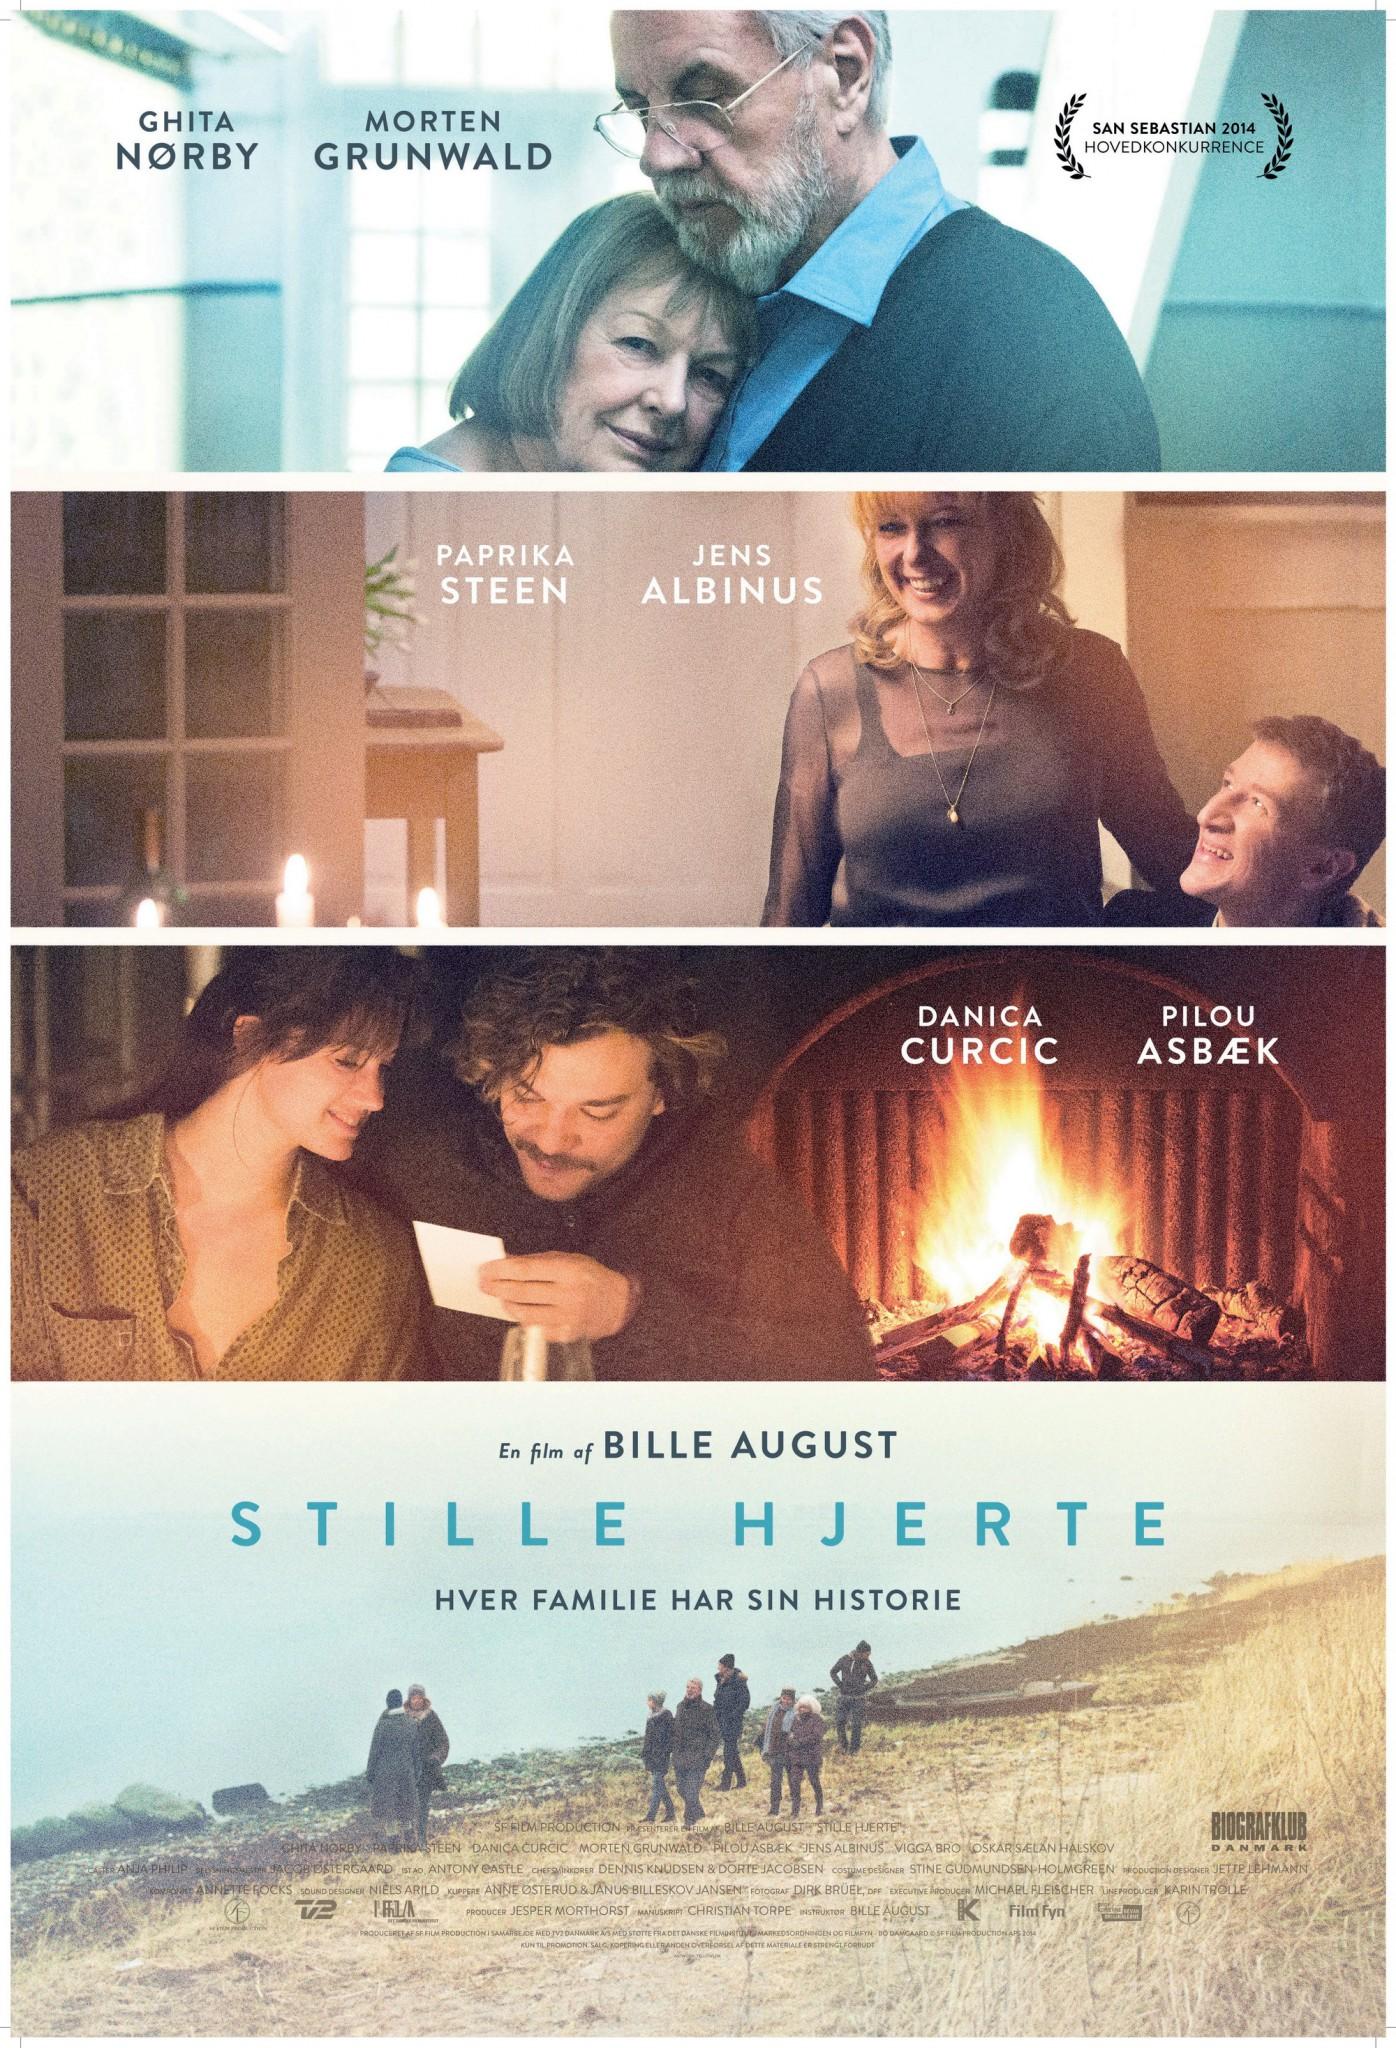 Rami širdis (2014) / Stille hjerte (2014)